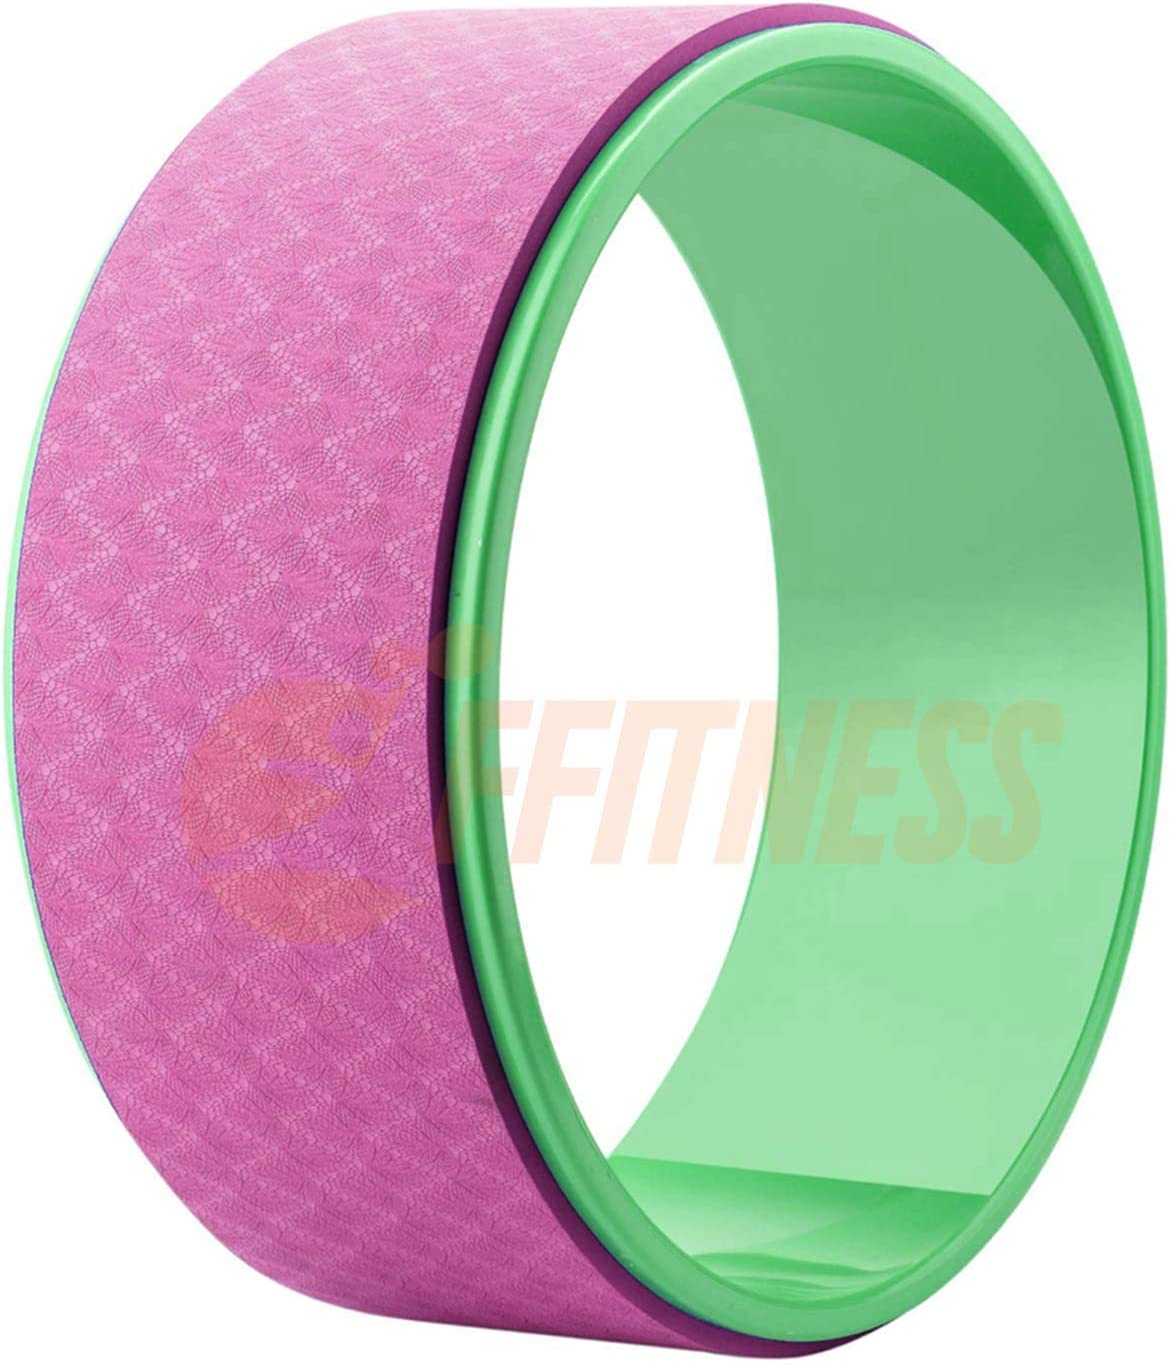 Gimnasia Gimnasio Body Dharma Yoga Wheel Fitness Superficie Antideslizante Anillo para Entrenamiento de Pilates